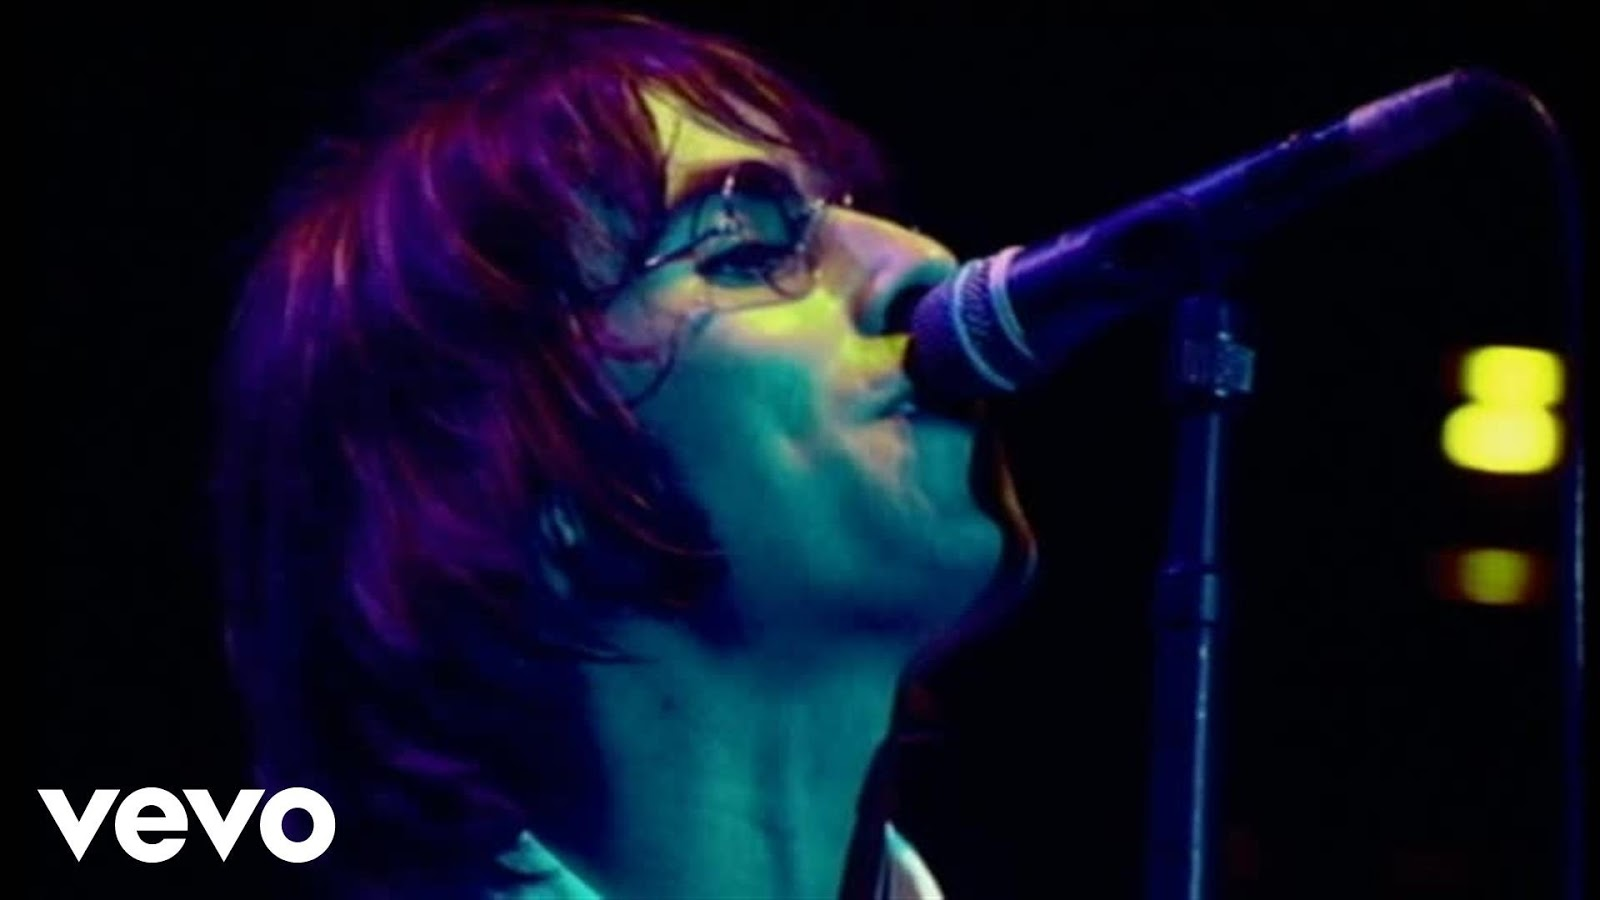 Oasis Champagne Supernova Guitar Chords Lyrics Kunci Gitar